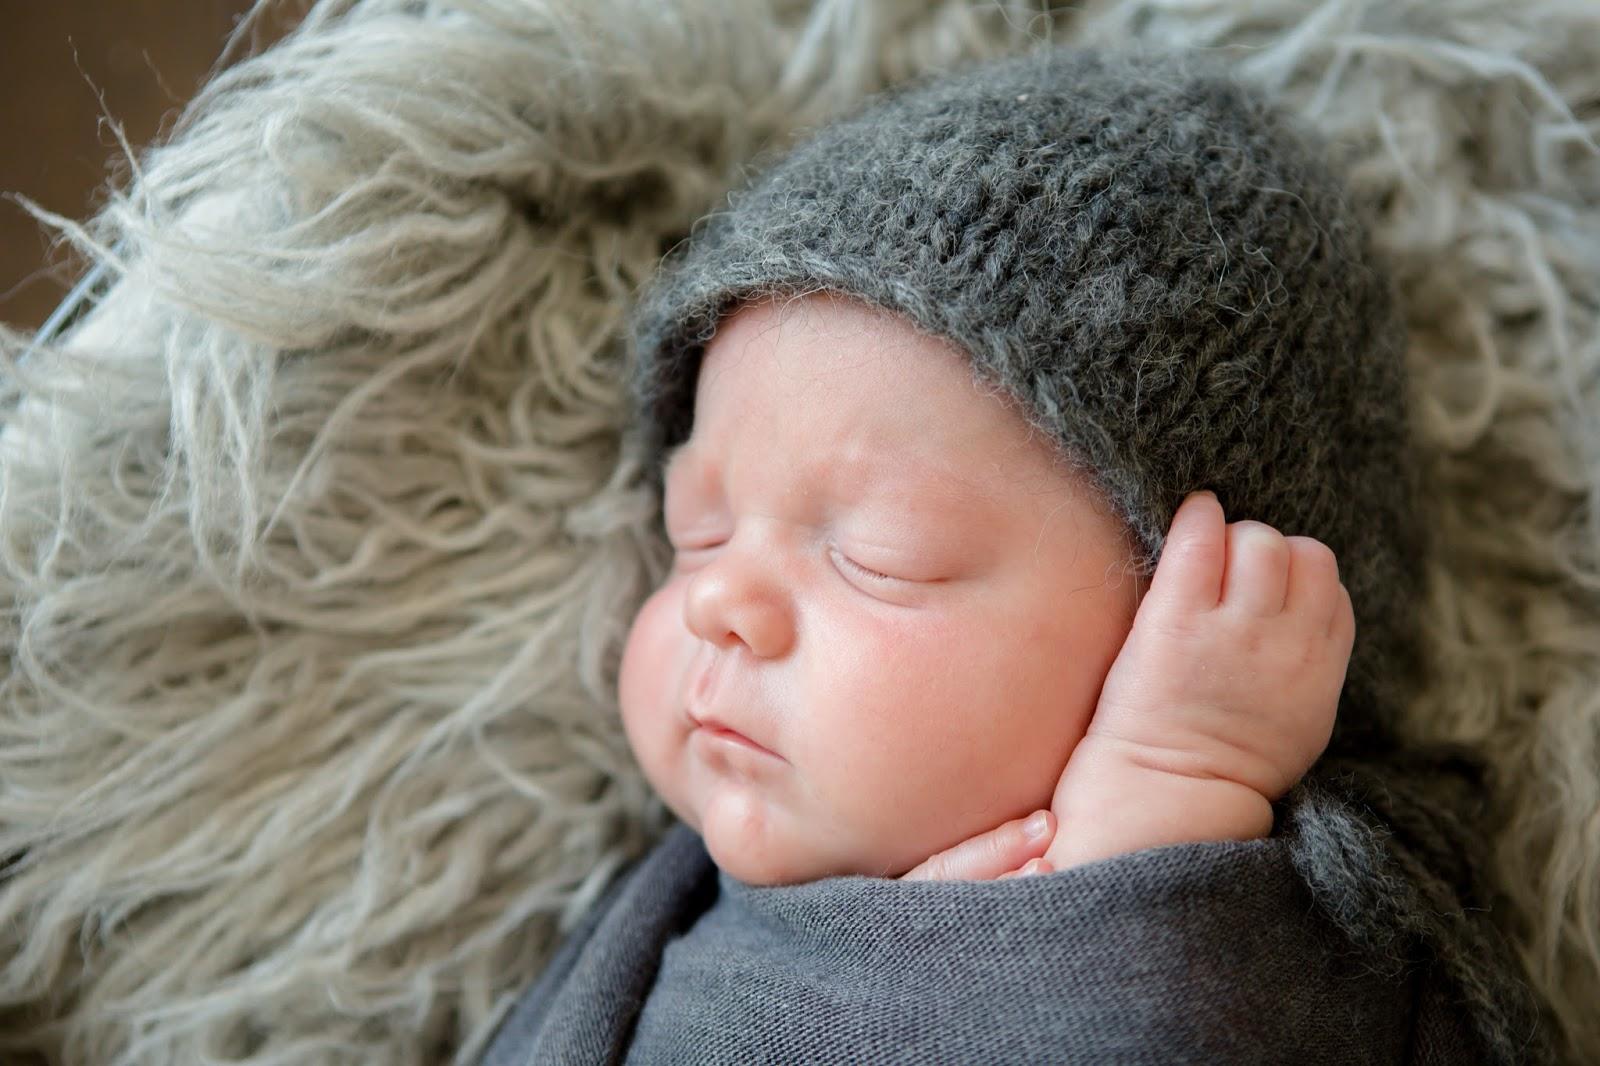 newborn baby boy in gray swaddle